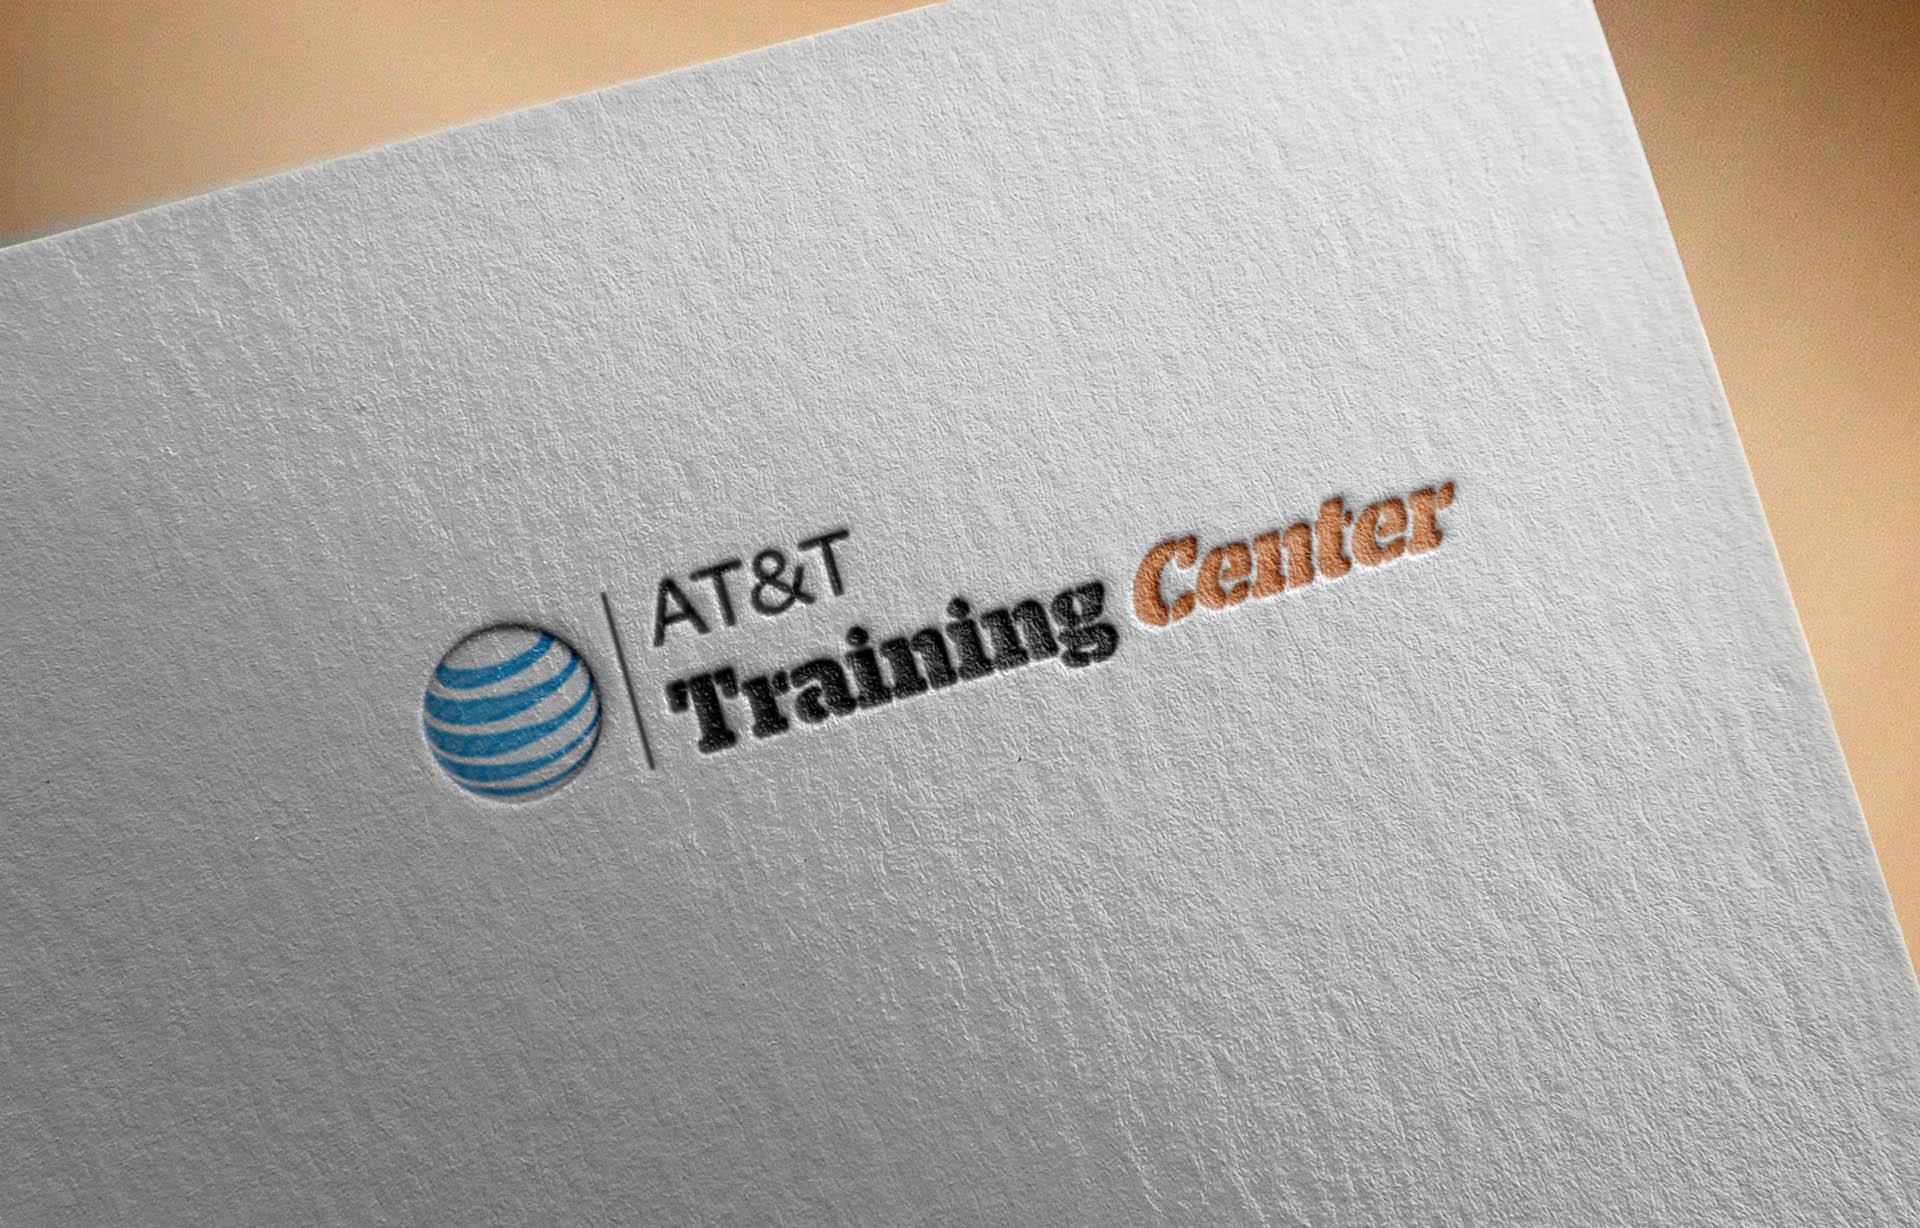 Adatto.cz, tvorba loga - AT&T Training Center